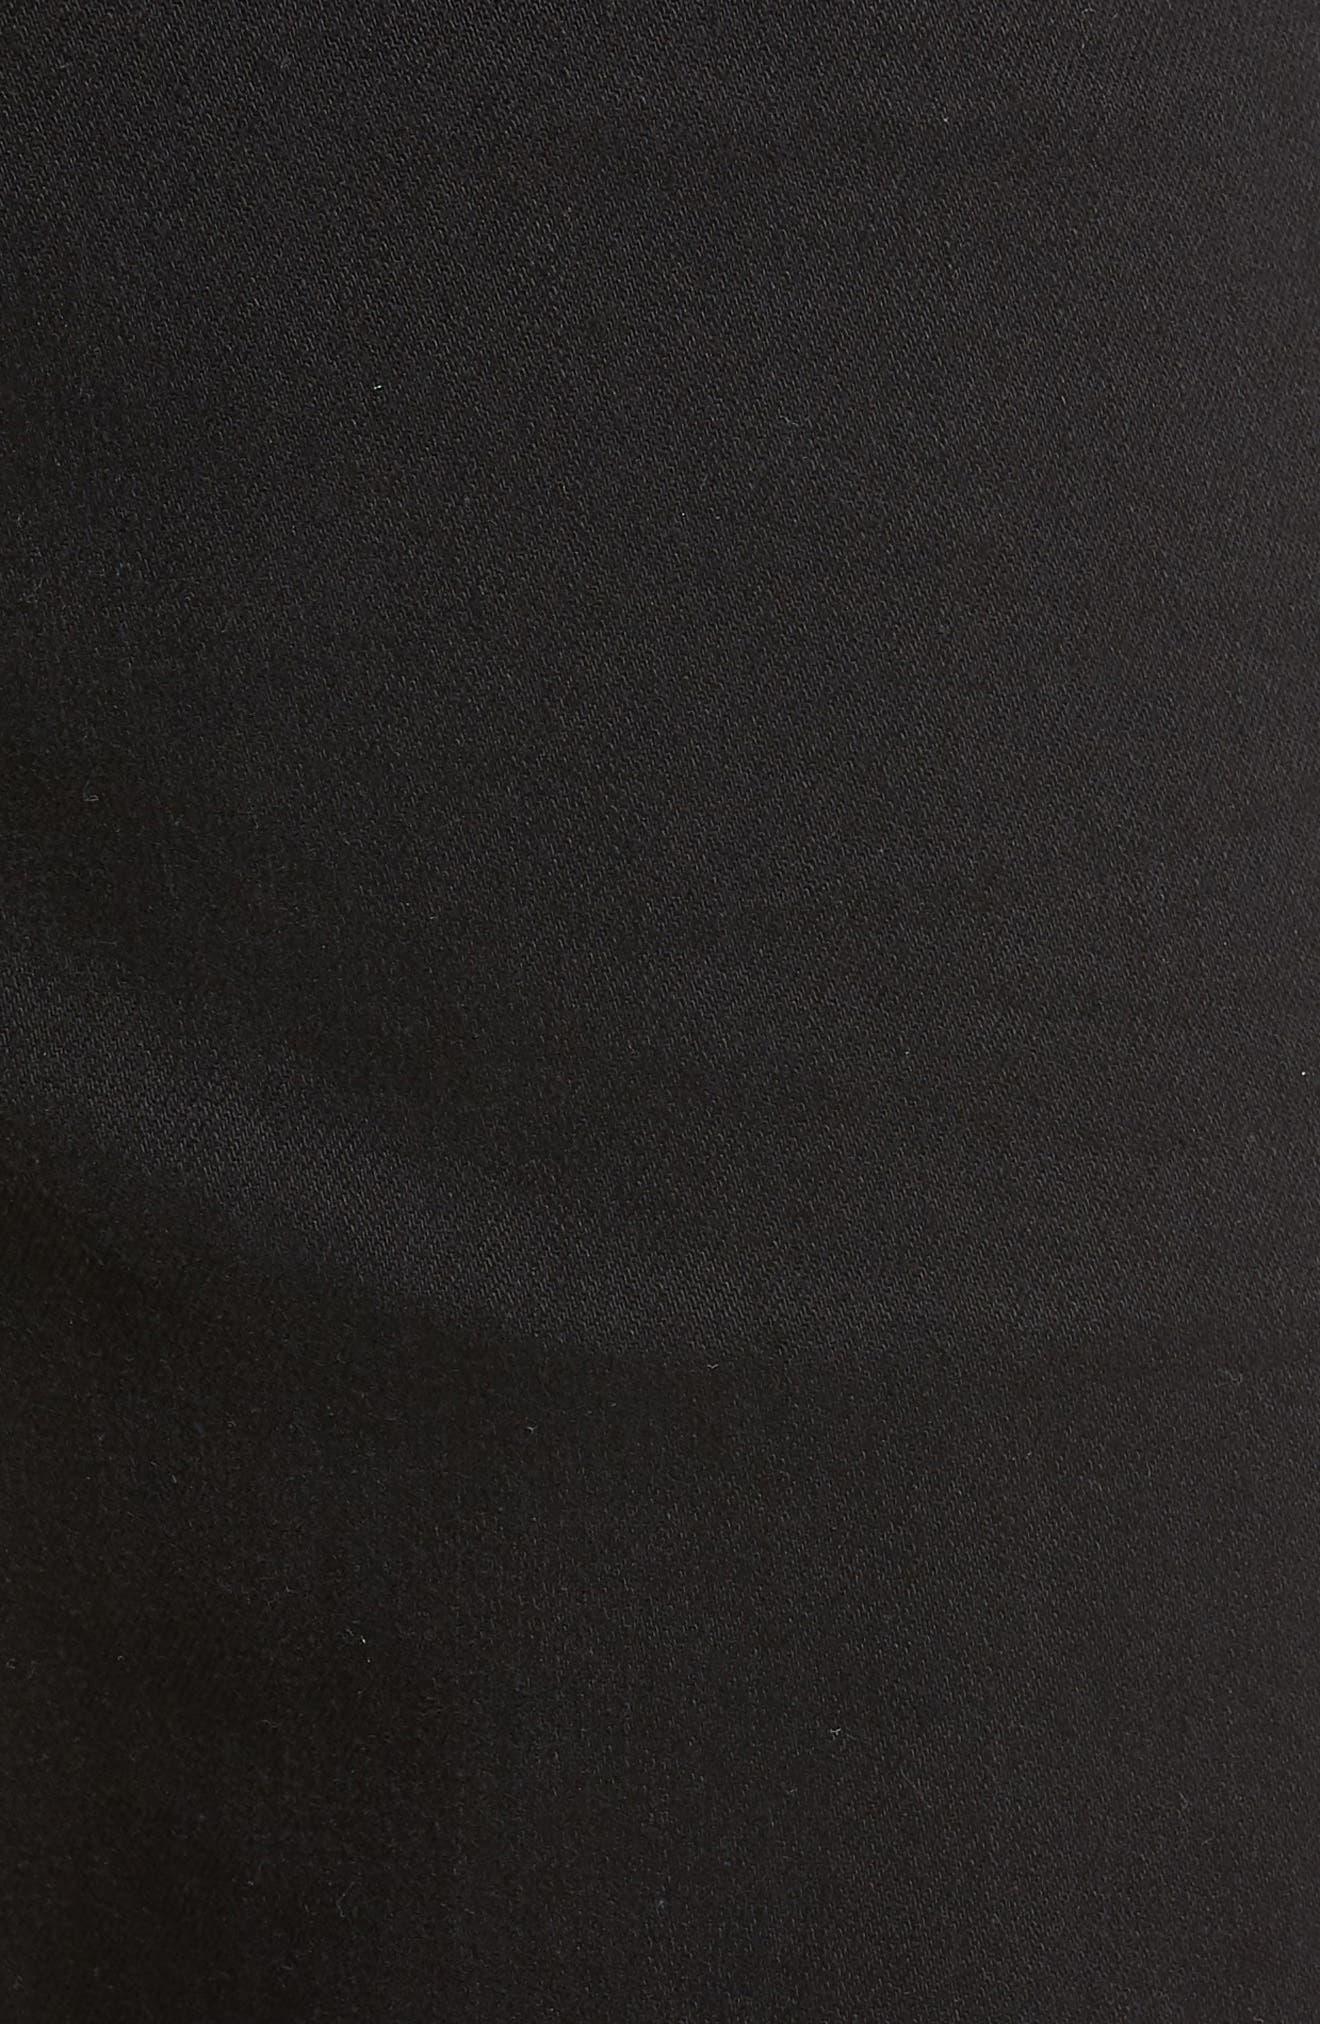 Blake Slim Fit Jeans,                             Alternate thumbnail 5, color,                             Heron